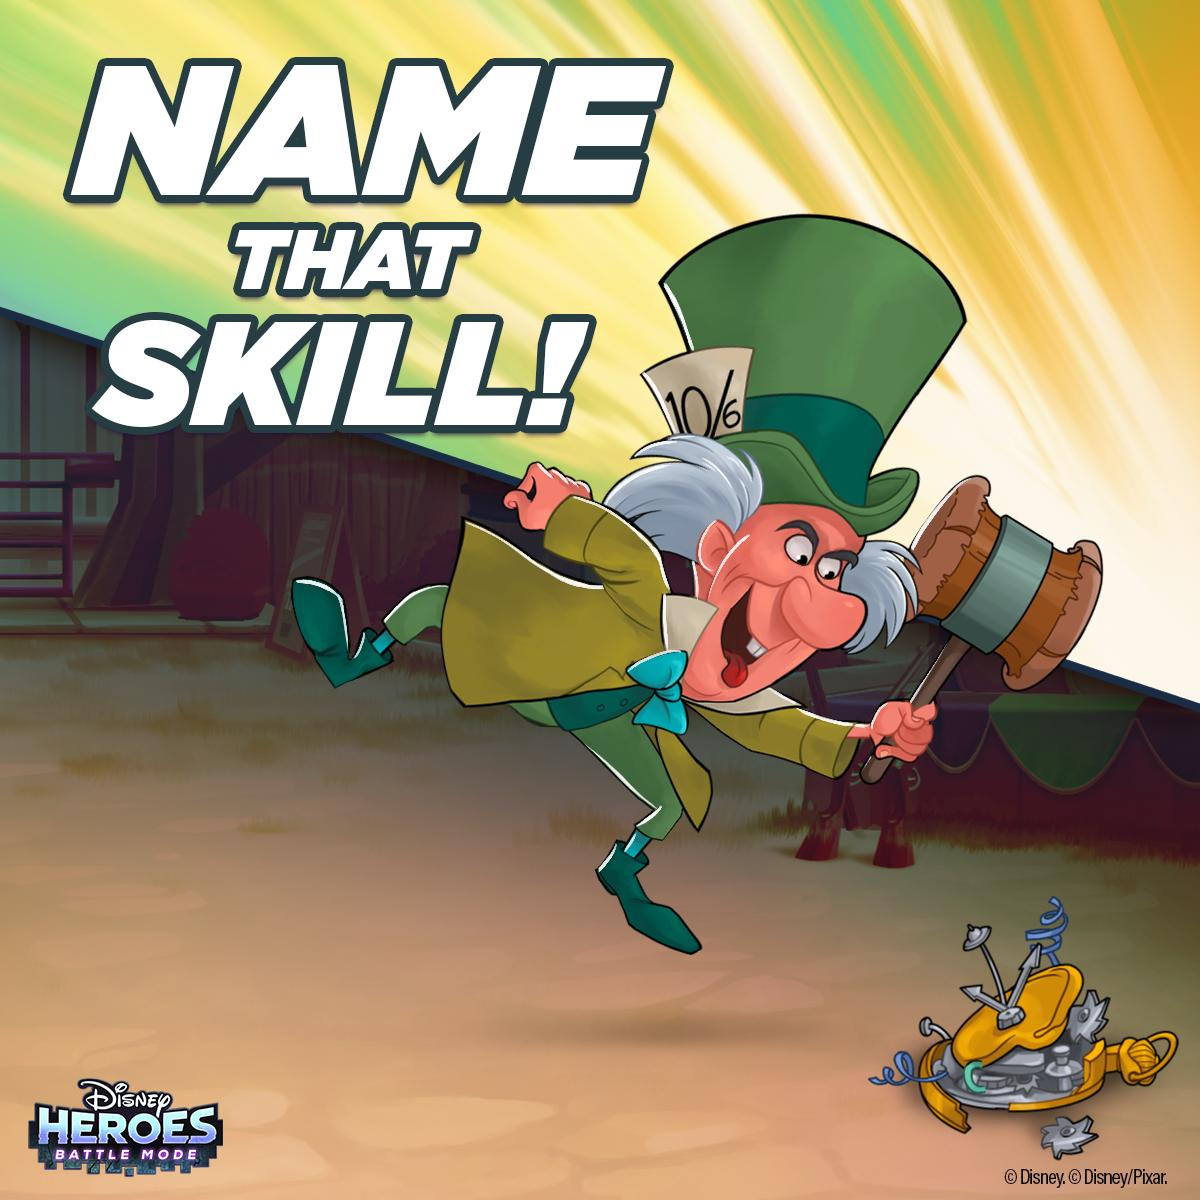 Disney Heroes: Battle Mode (@DisneyHeroesRPG) | Twitter